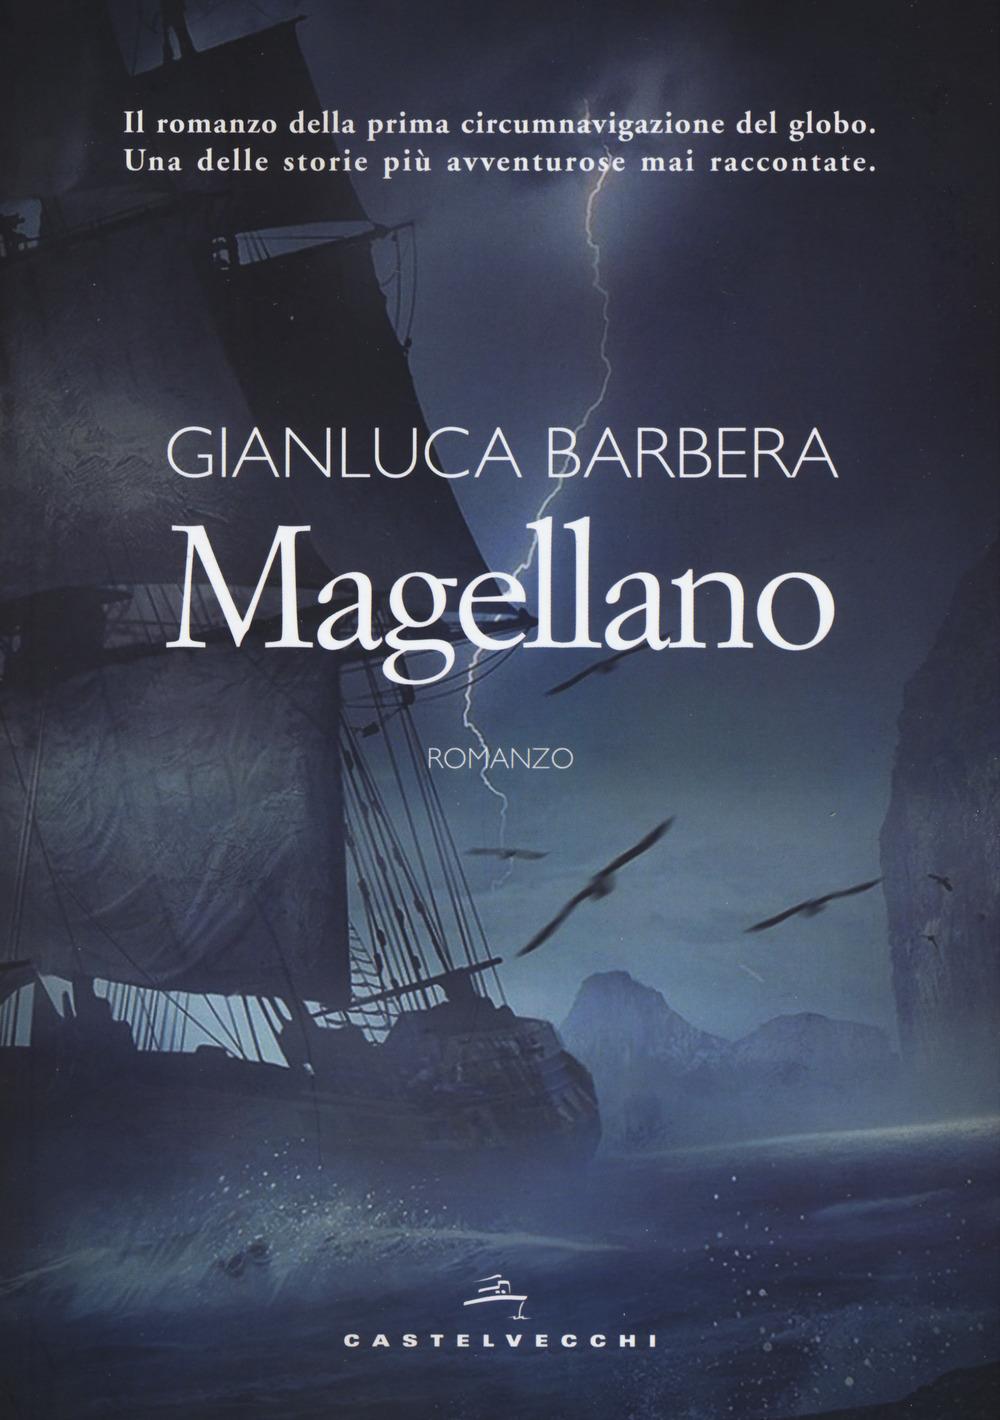 Magellano